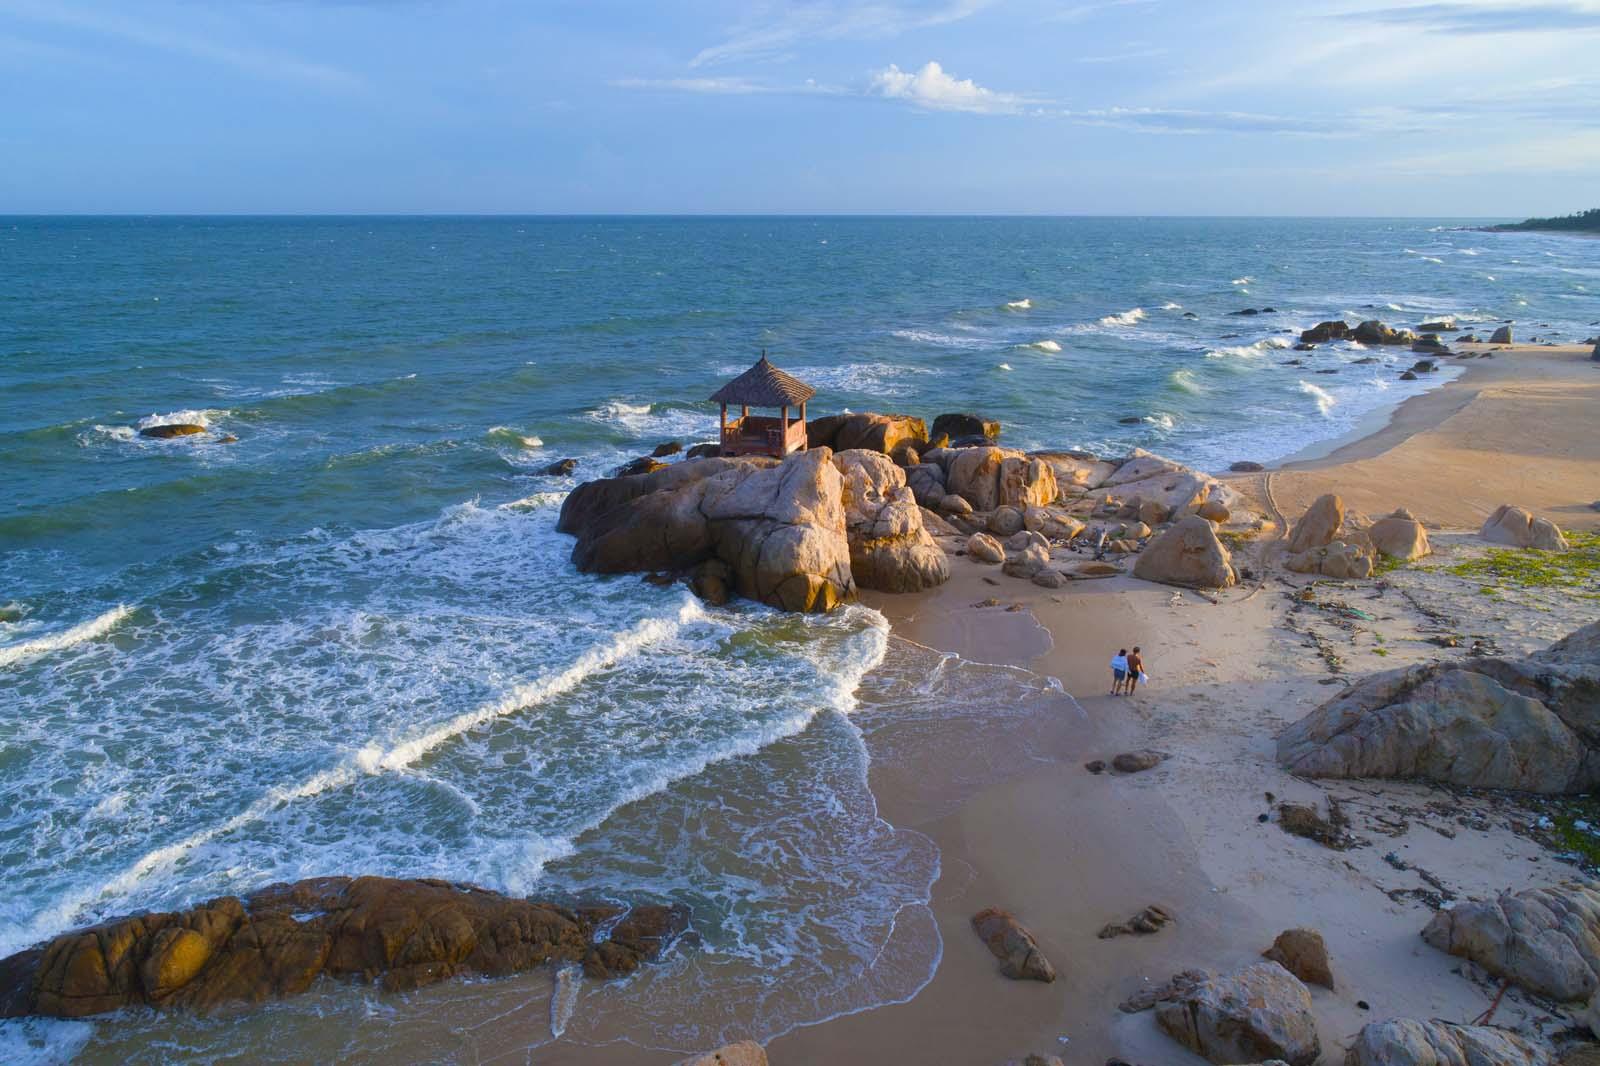 Вьетнам, Ке Га, скалы, море, aerial, Борис Резванцев